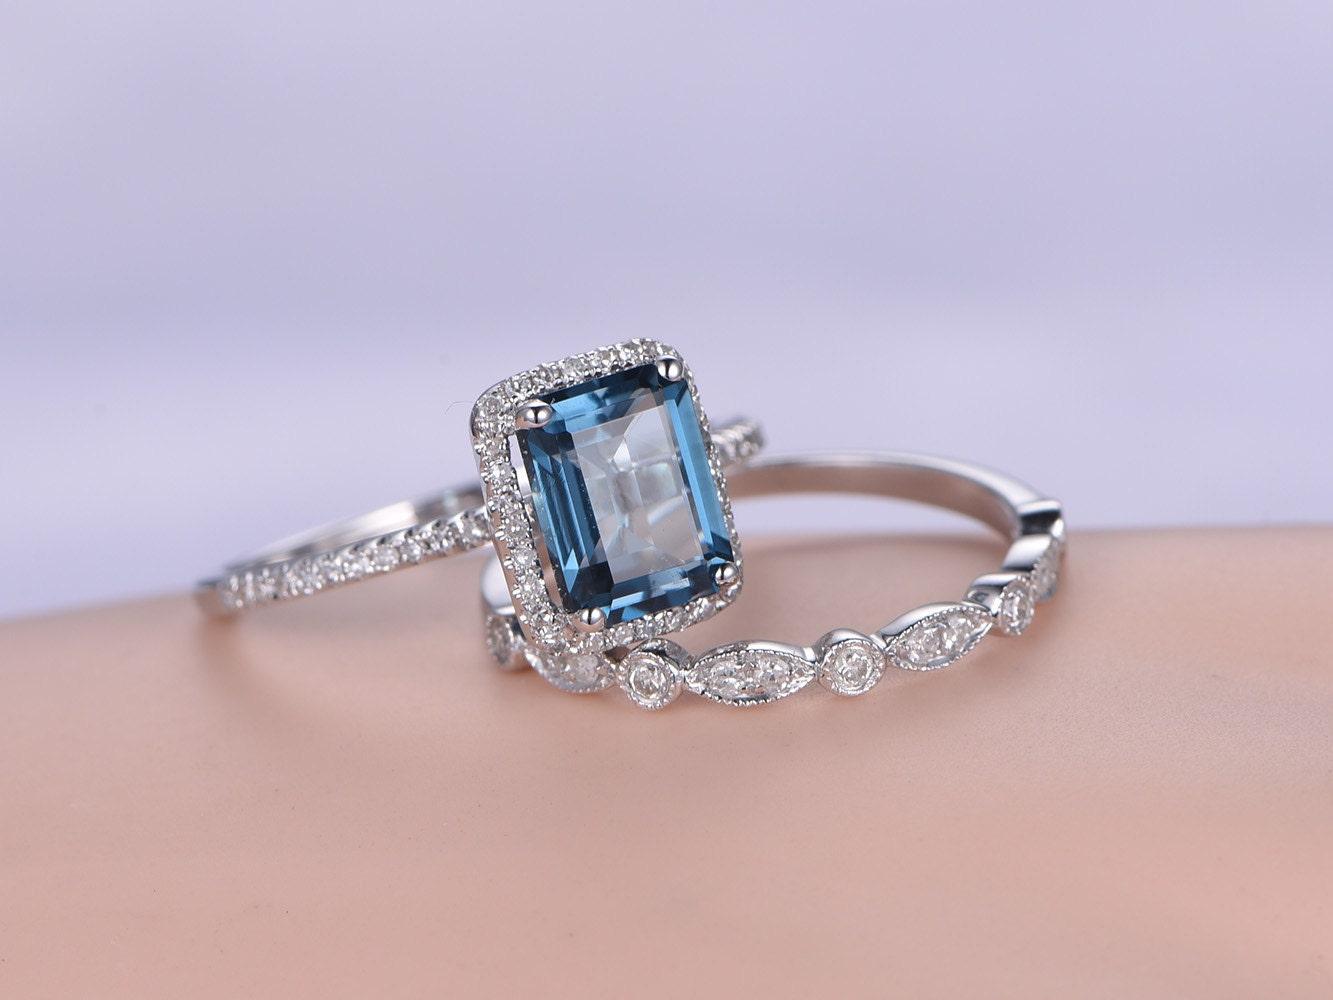 emerald cut blue topaz bridal ring set2pcs by